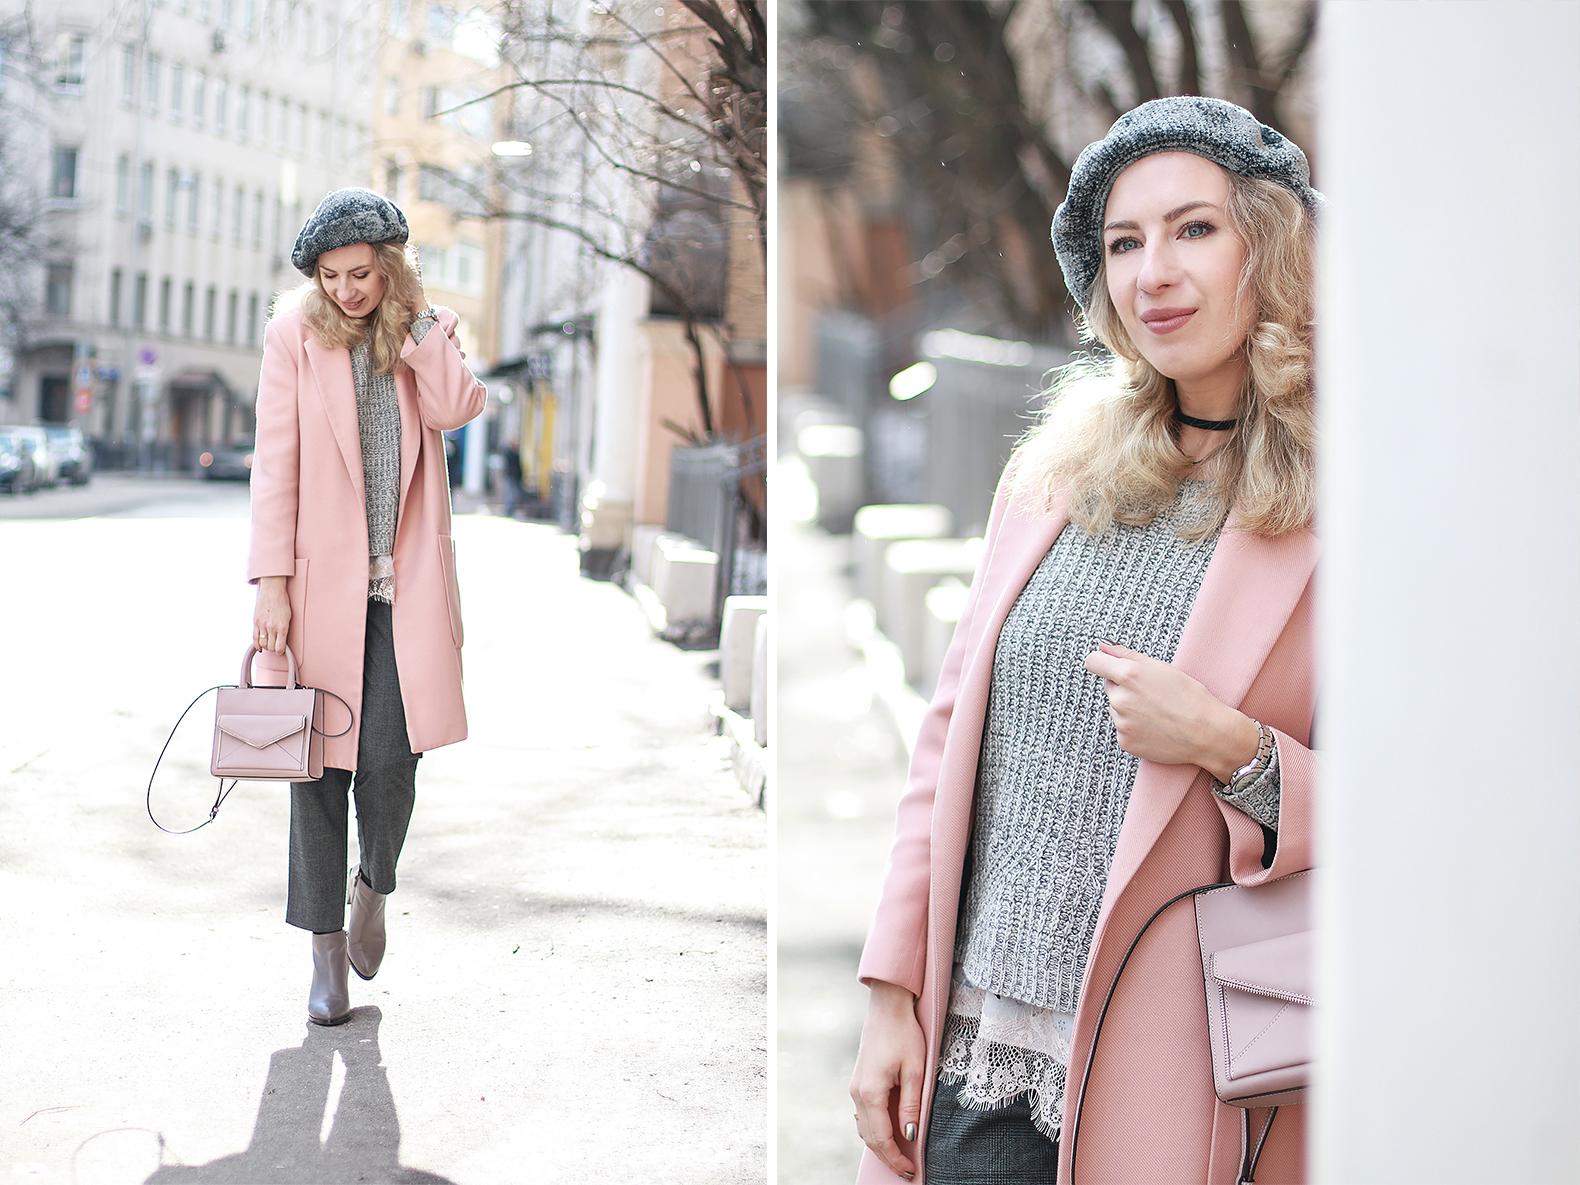 Margarita_Maslova_Ritalifestyle_Fashion_blogger_Moscow_pastel_spring_looks_pink_coat_beret_velvet